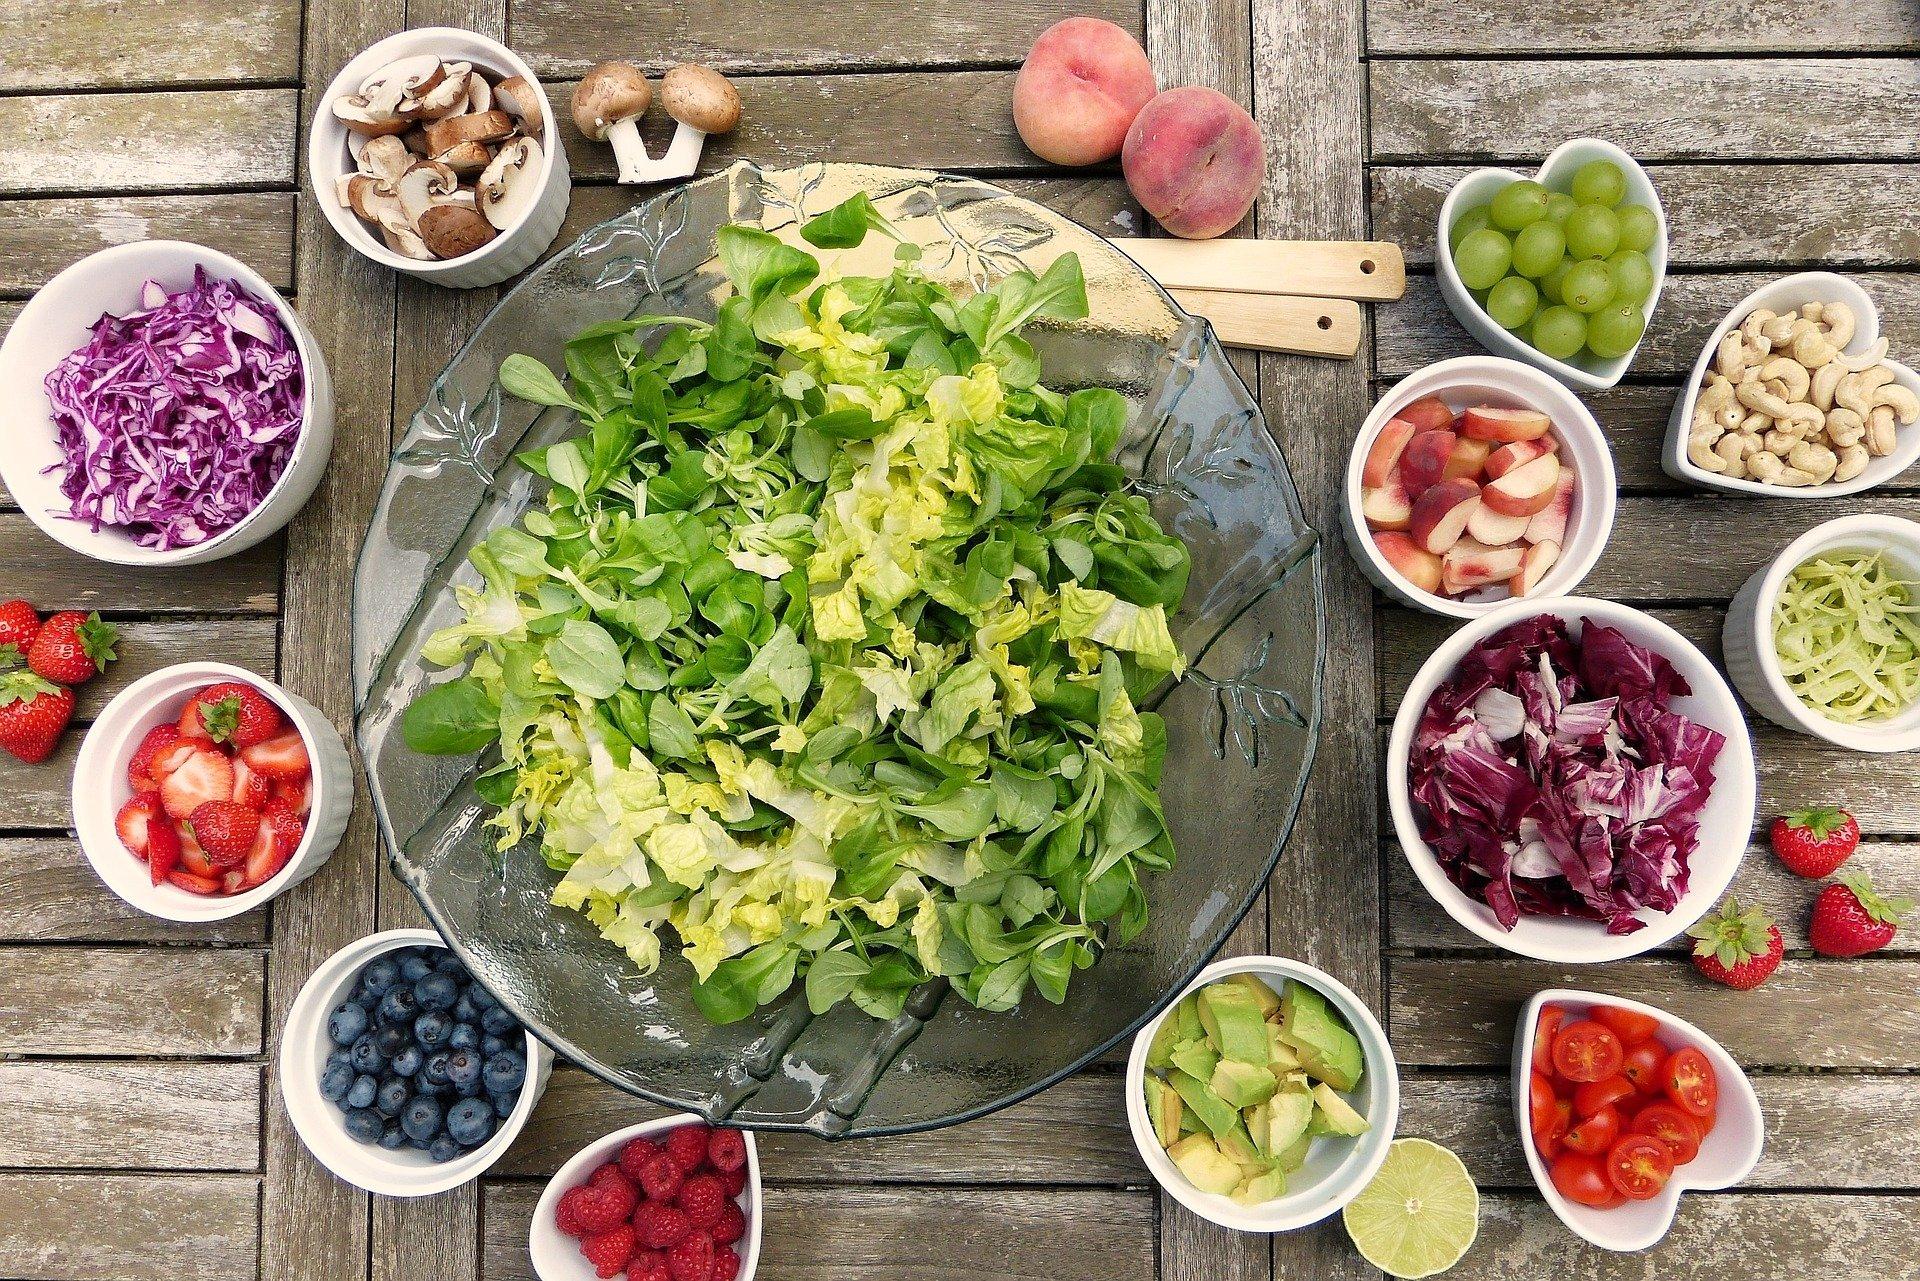 salad-2756467_1920 (1)